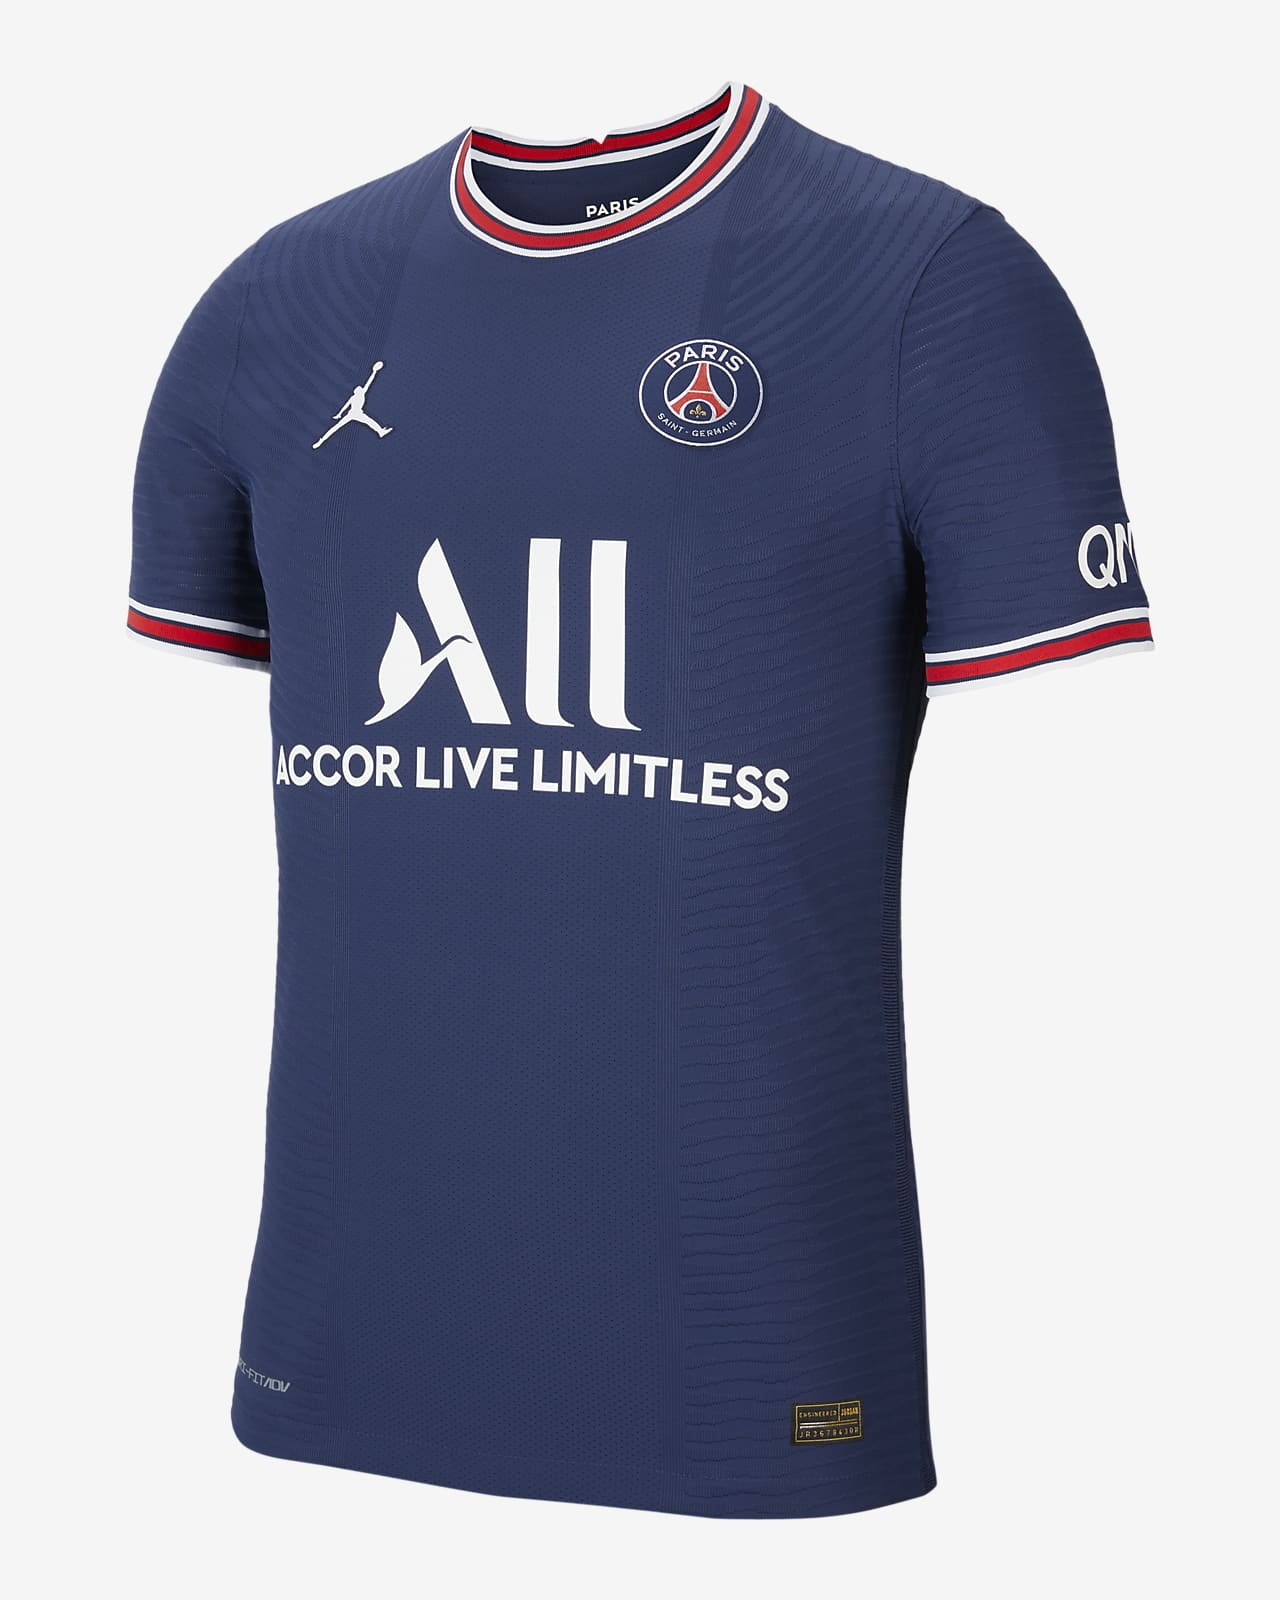 Maglia da calcio Nike Dri-FIT ADV Paris Saint-Germain 2021/22 Match da uomo - Home